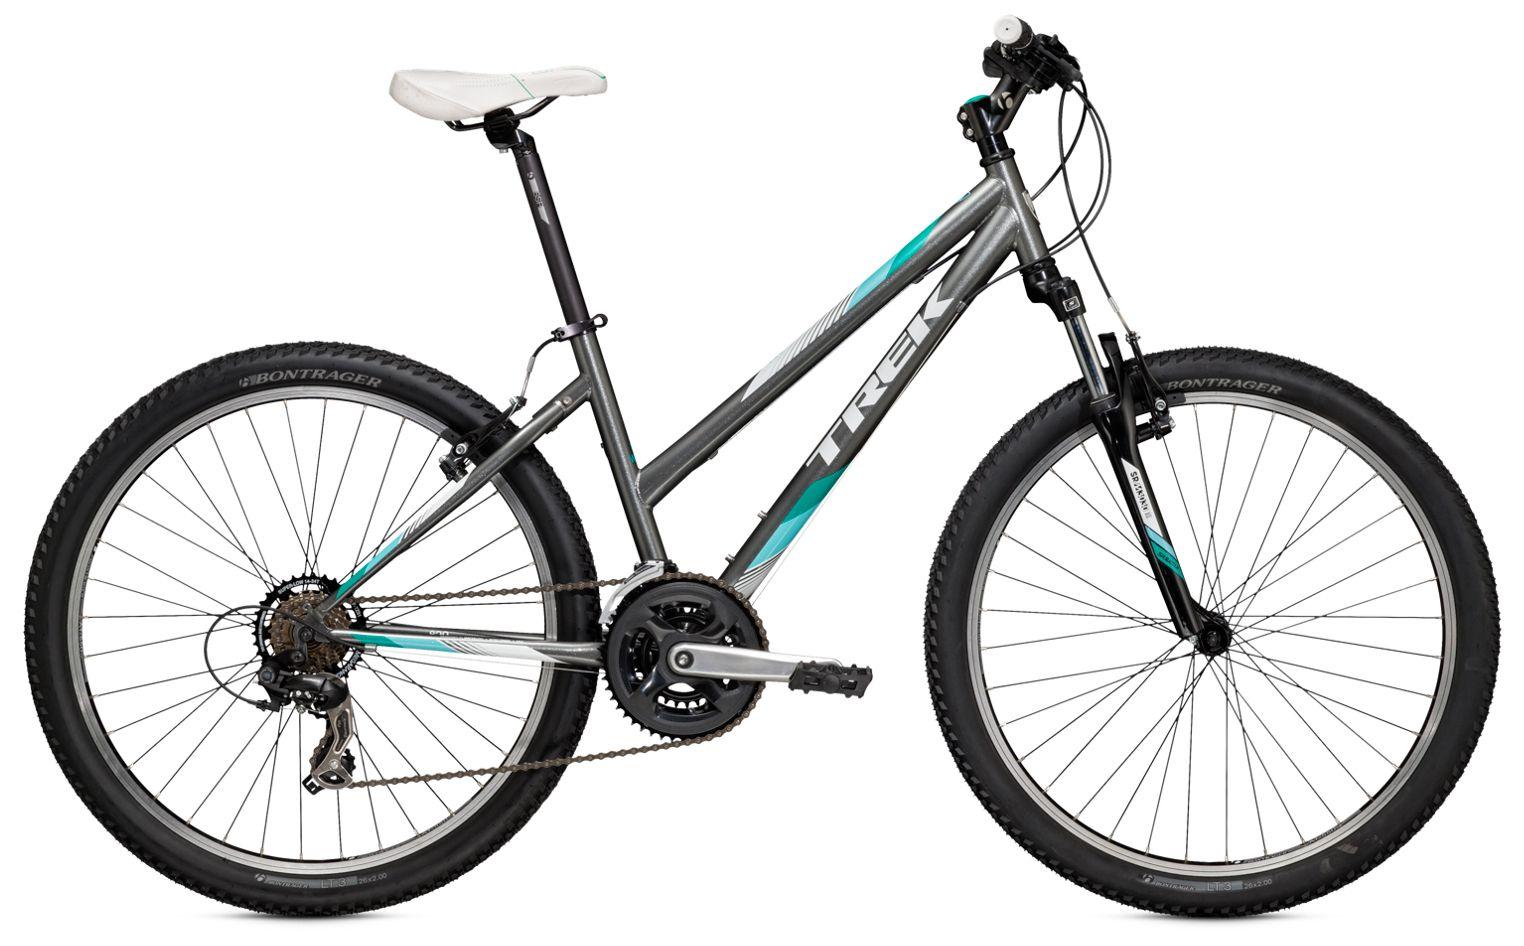 Велосипед Trek 820 WSD 2016 велосипед trek madone 3 1 wsd 2013